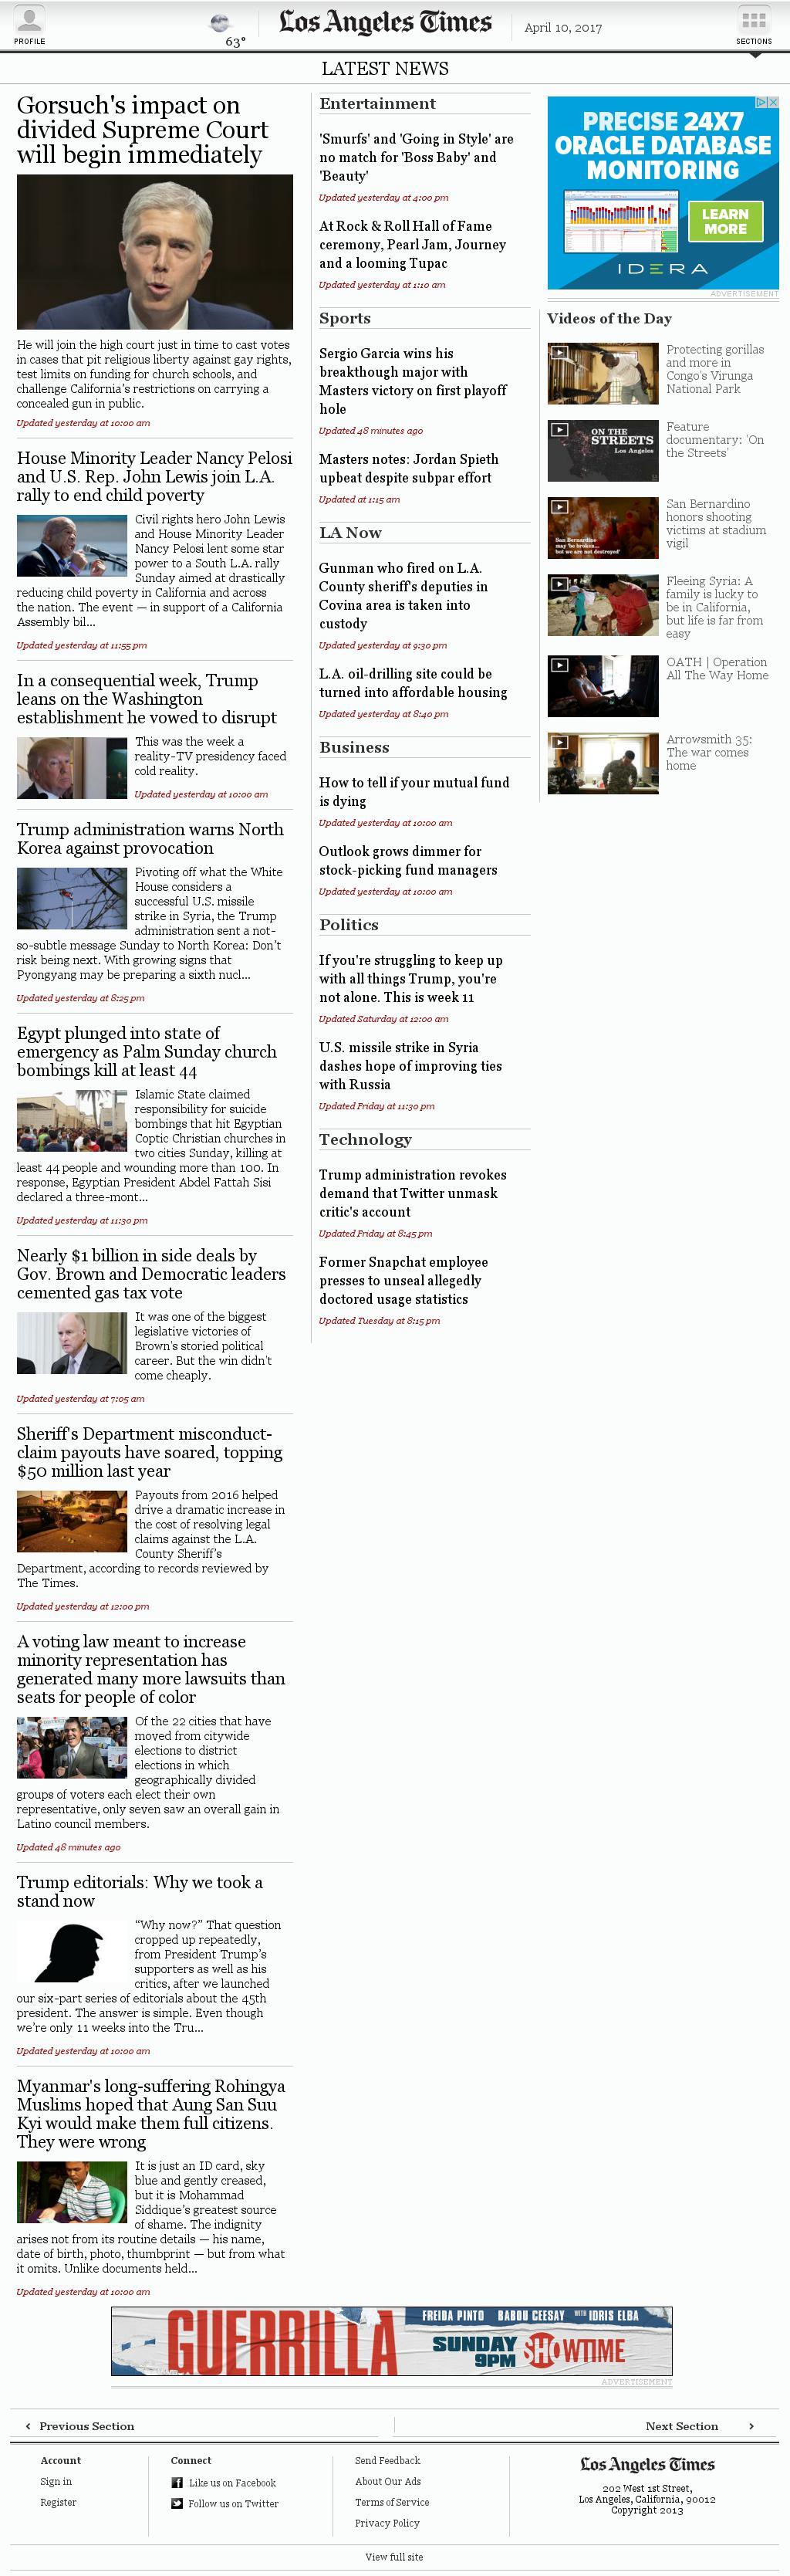 Los Angeles Times at Monday April 10, 2017, 4:08 a.m. UTC